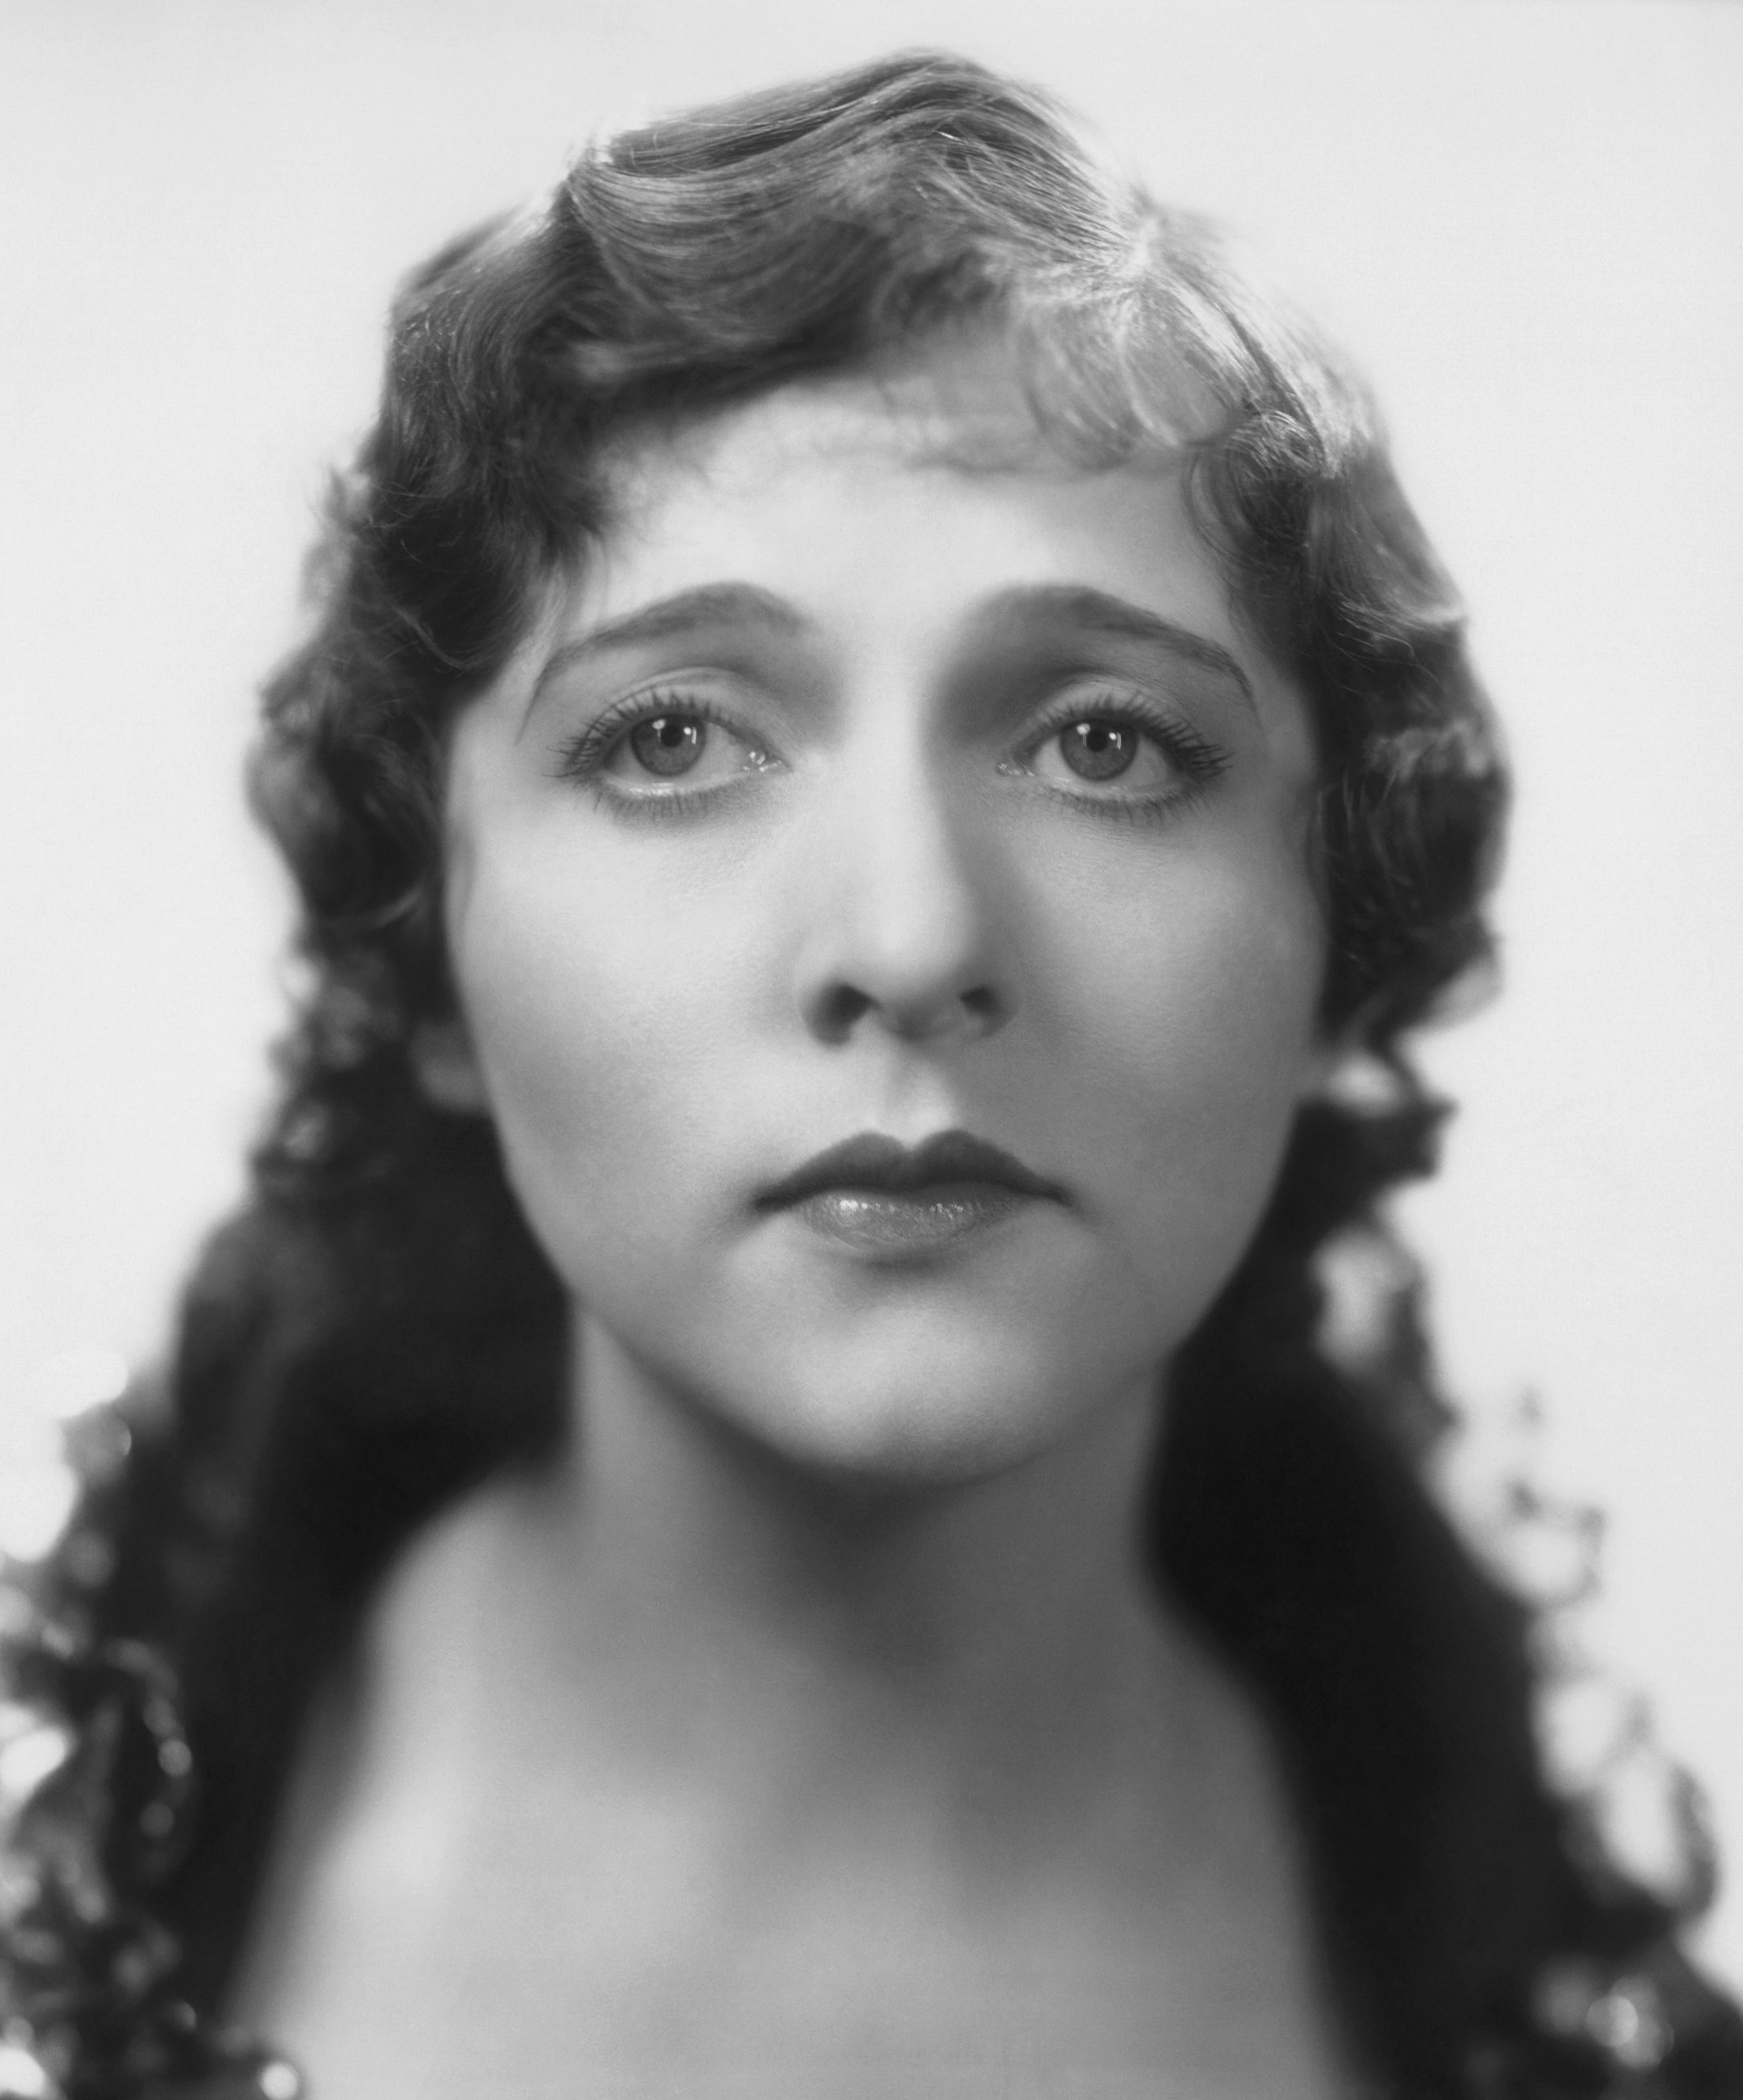 jessie royce landis betty white